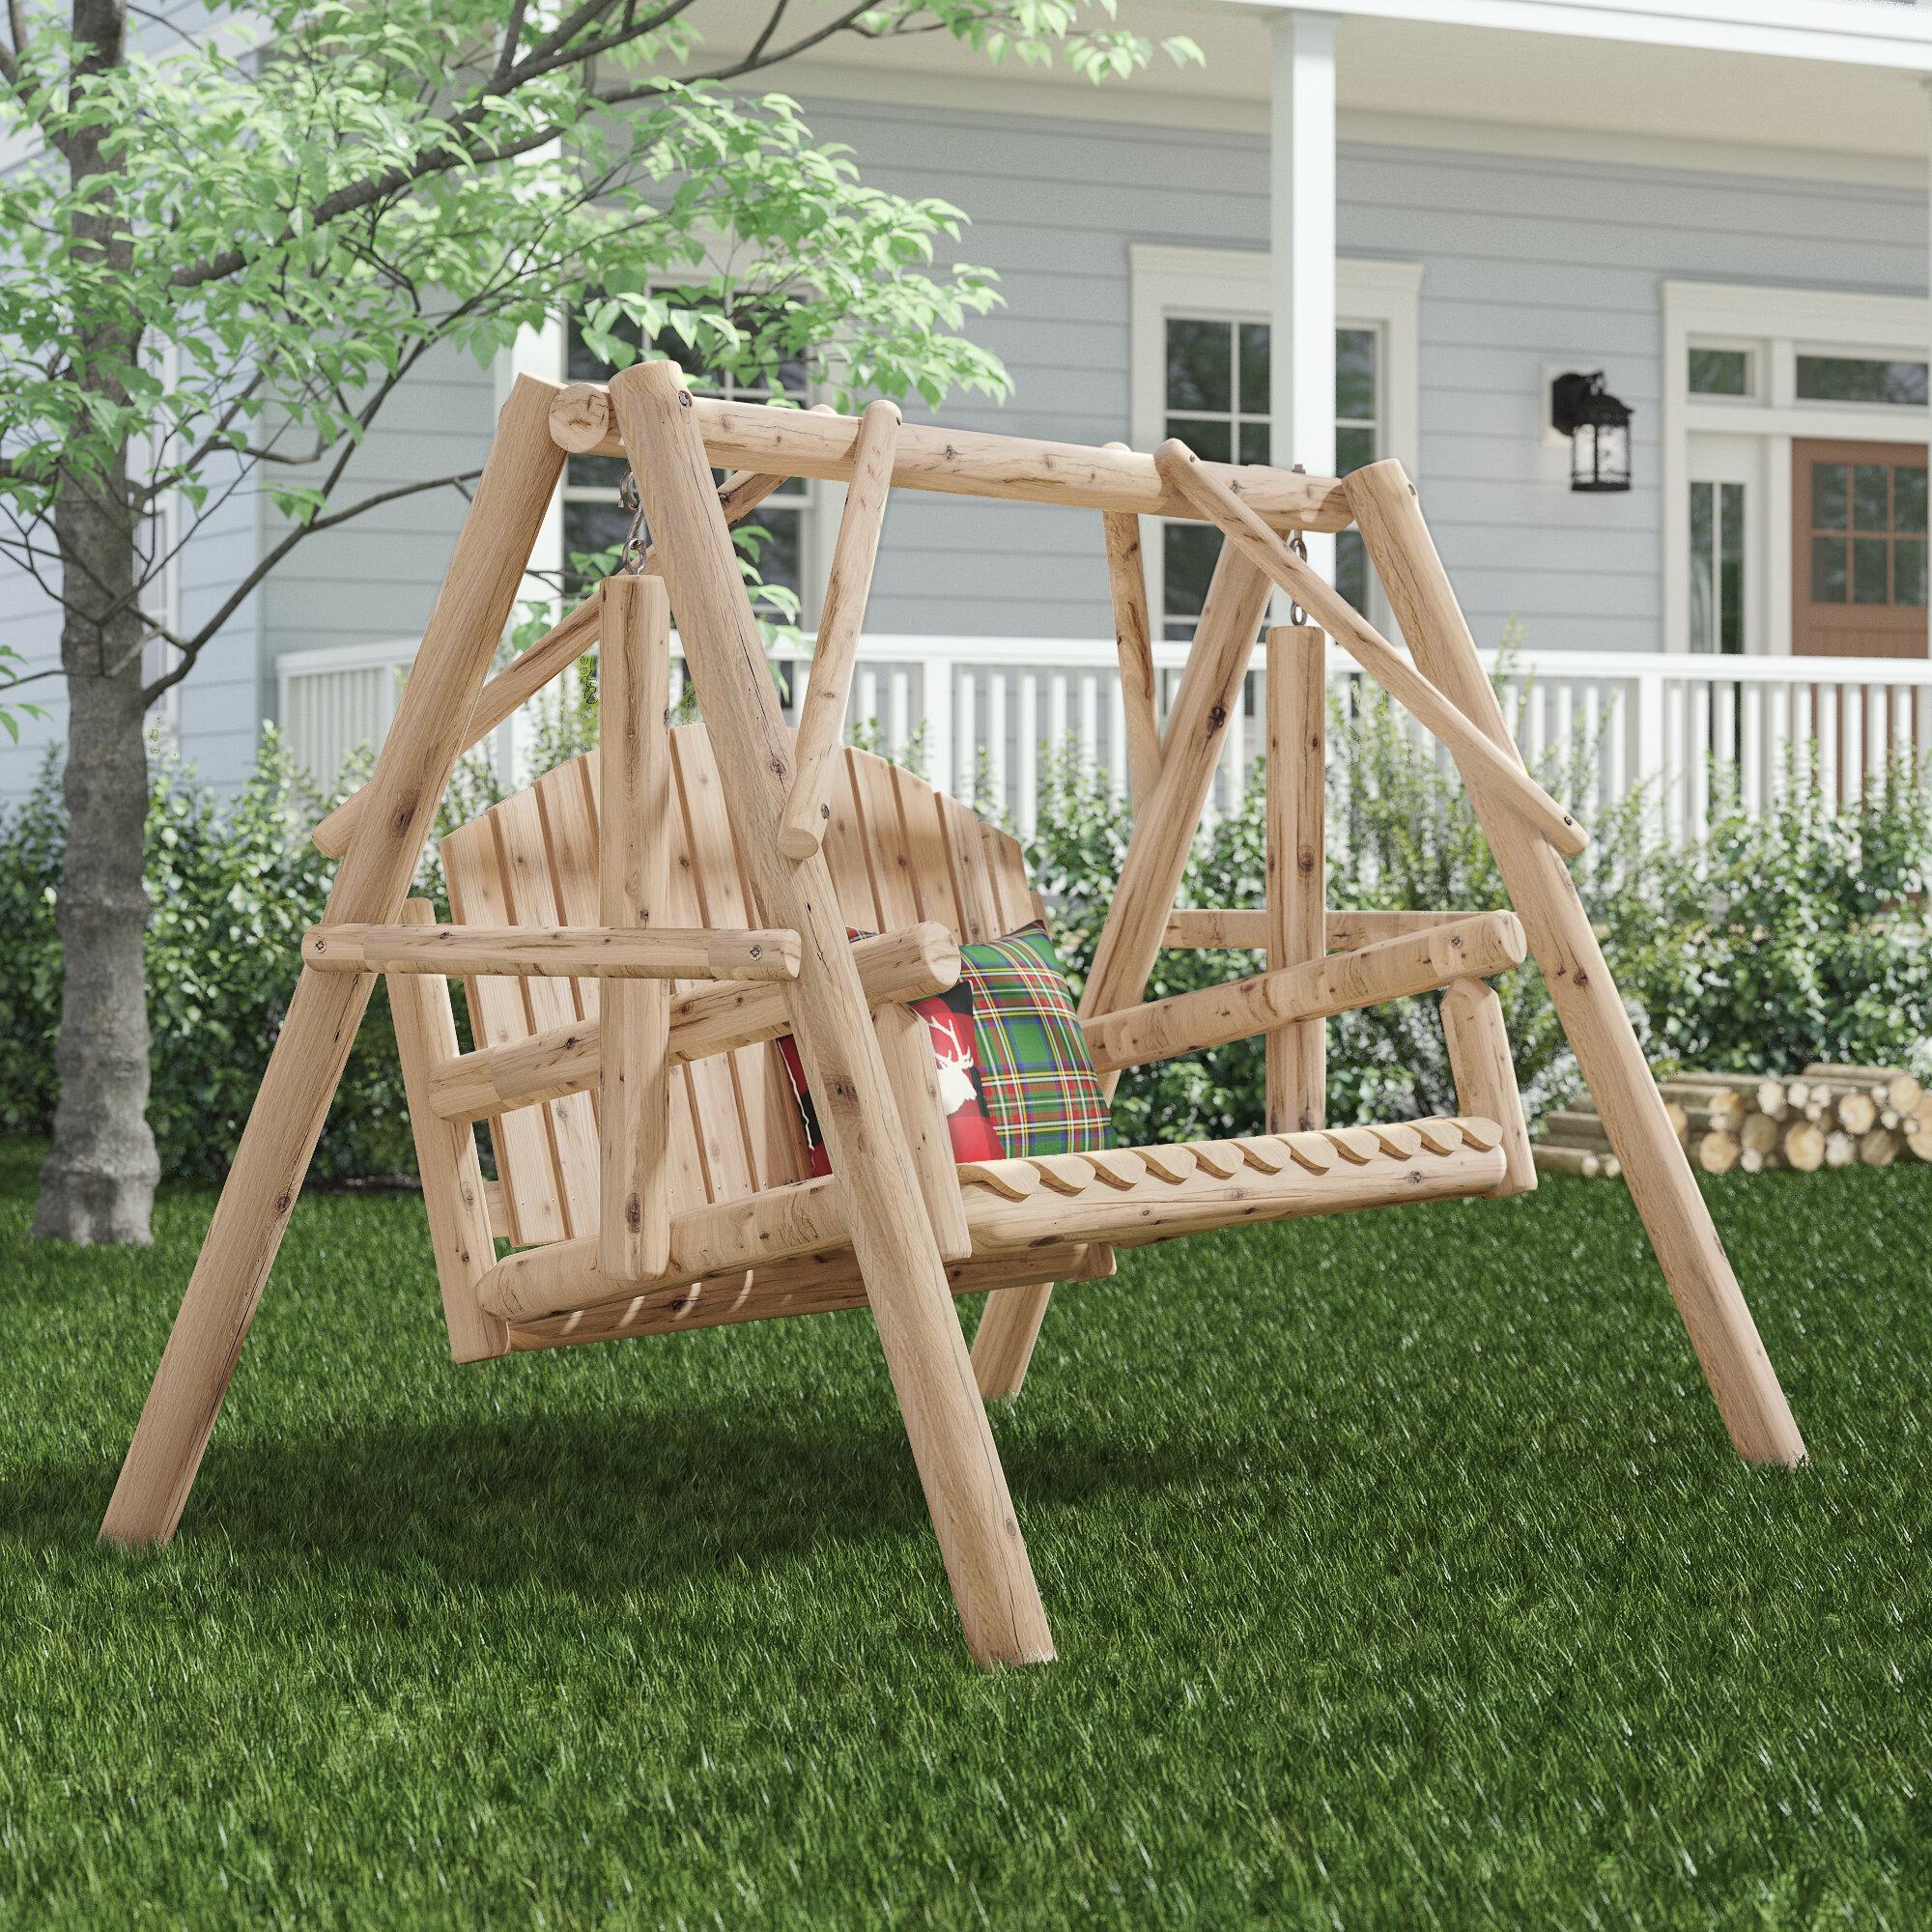 Rustic Porch Swings You Ll Love In 2021 Wayfair